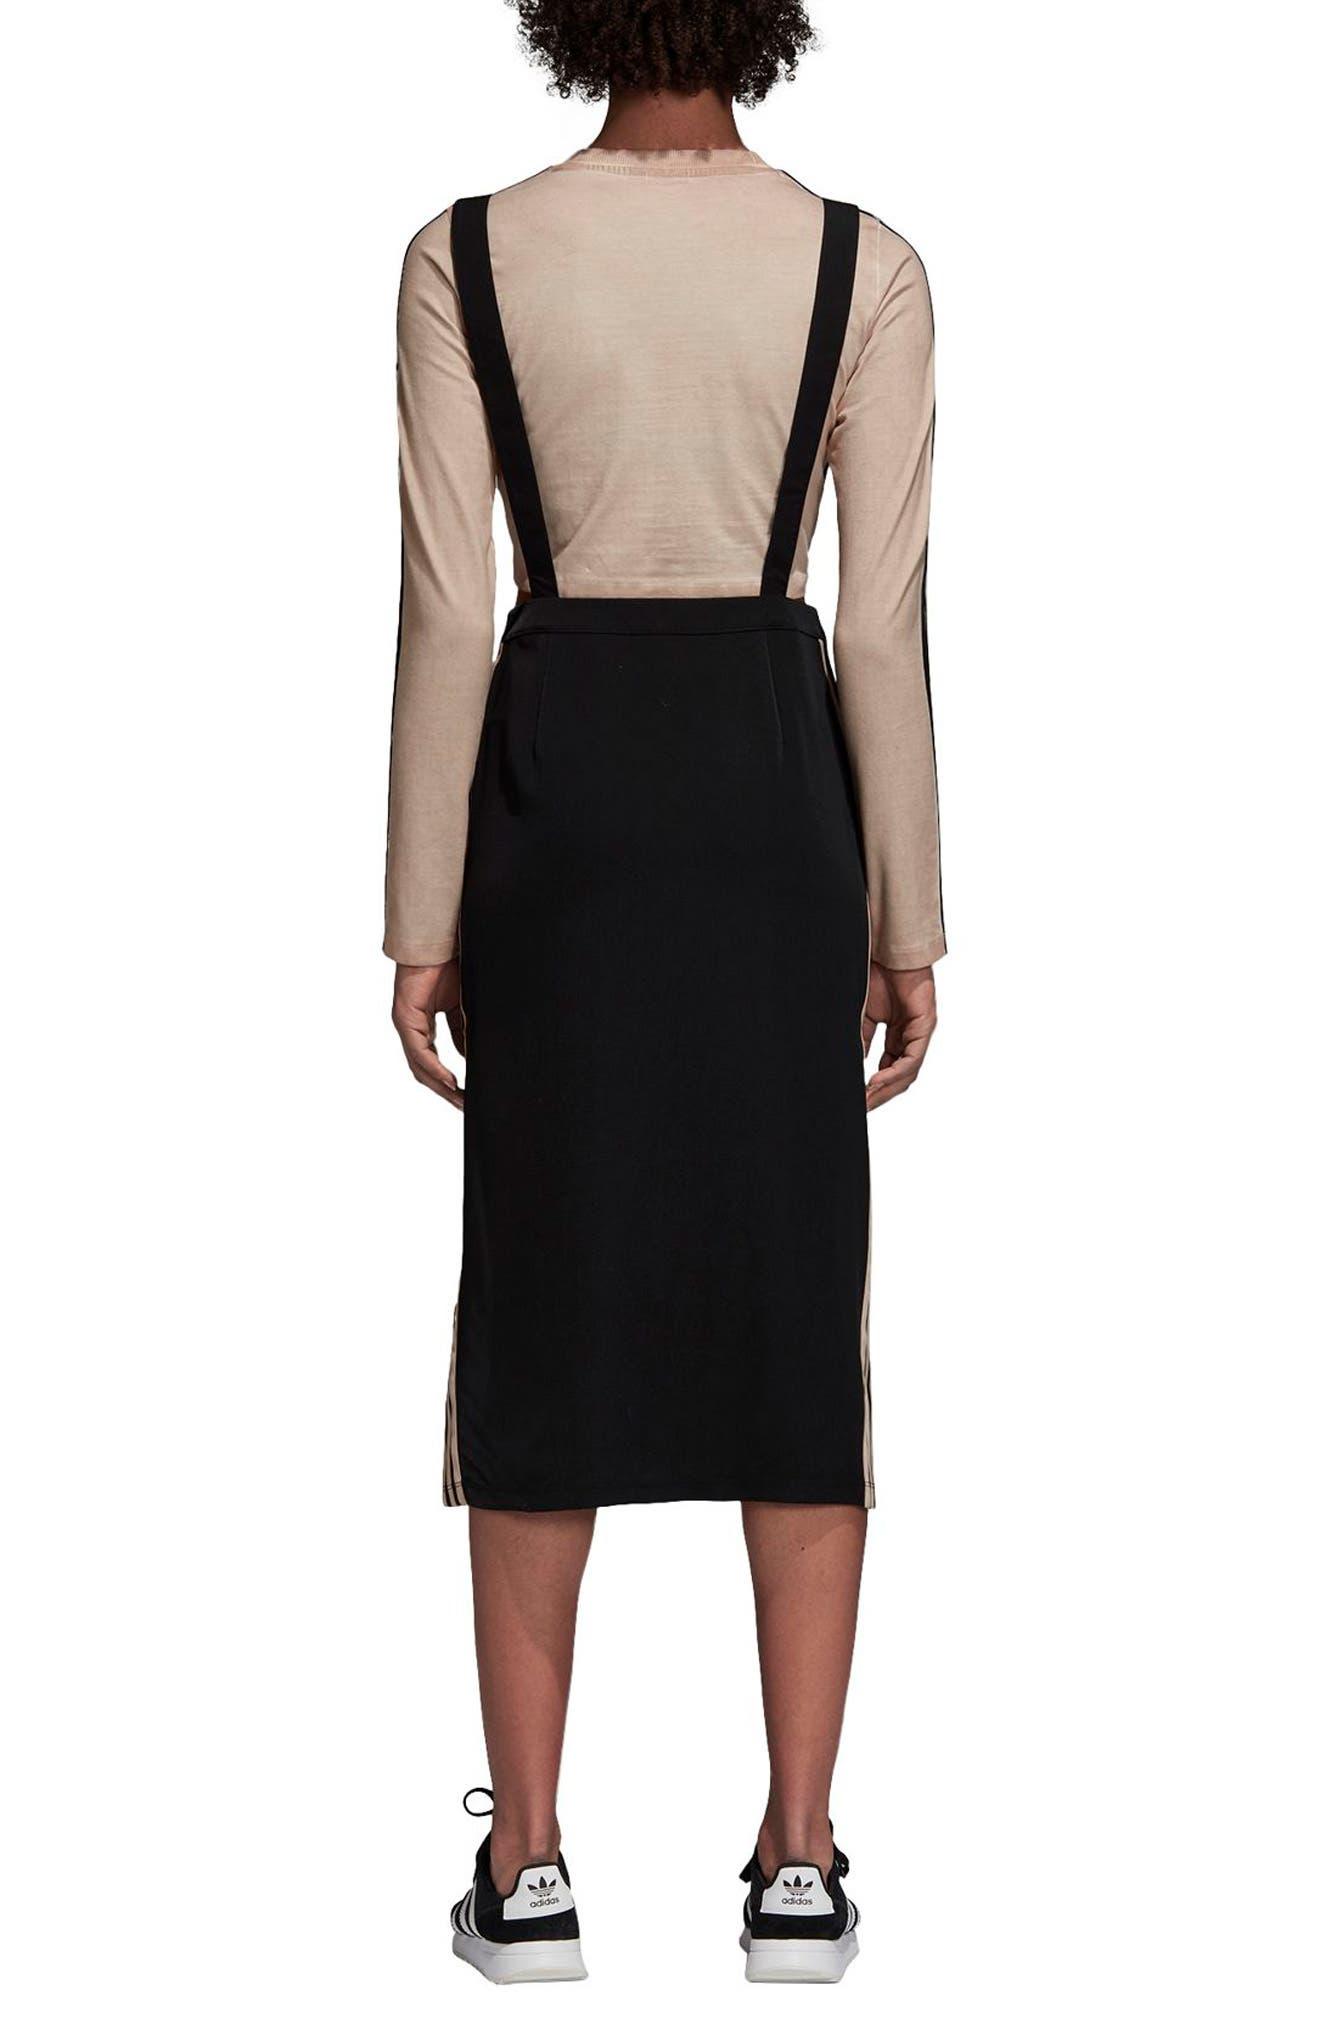 ADIDAS ORIGINALS,                             Midi Skirt with Shoulder Straps,                             Alternate thumbnail 2, color,                             001